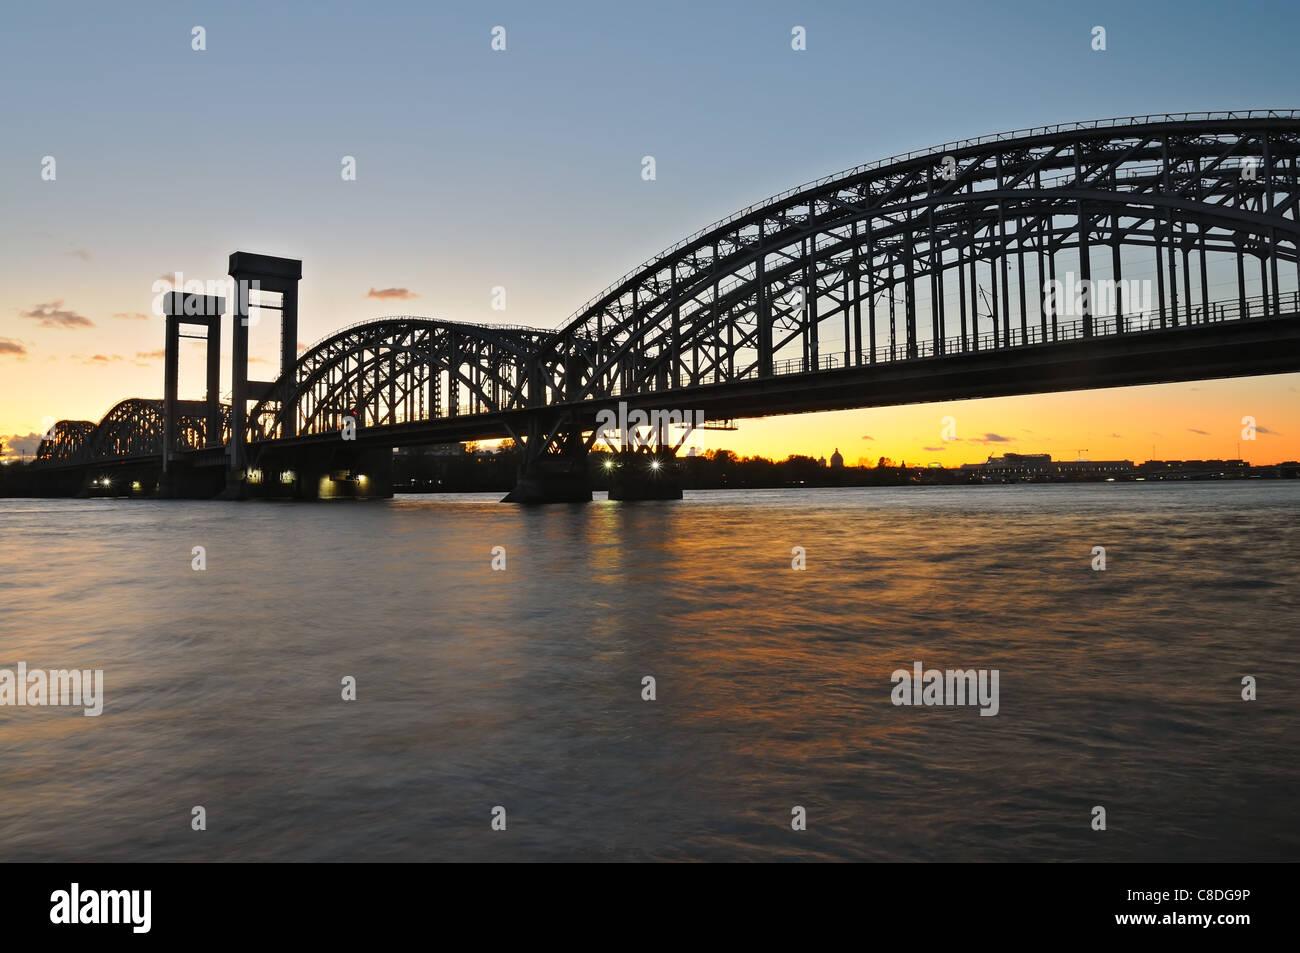 Night view of Finland Railway Bridge, Neva river, Saint Petersburg, Russia. - Stock Image